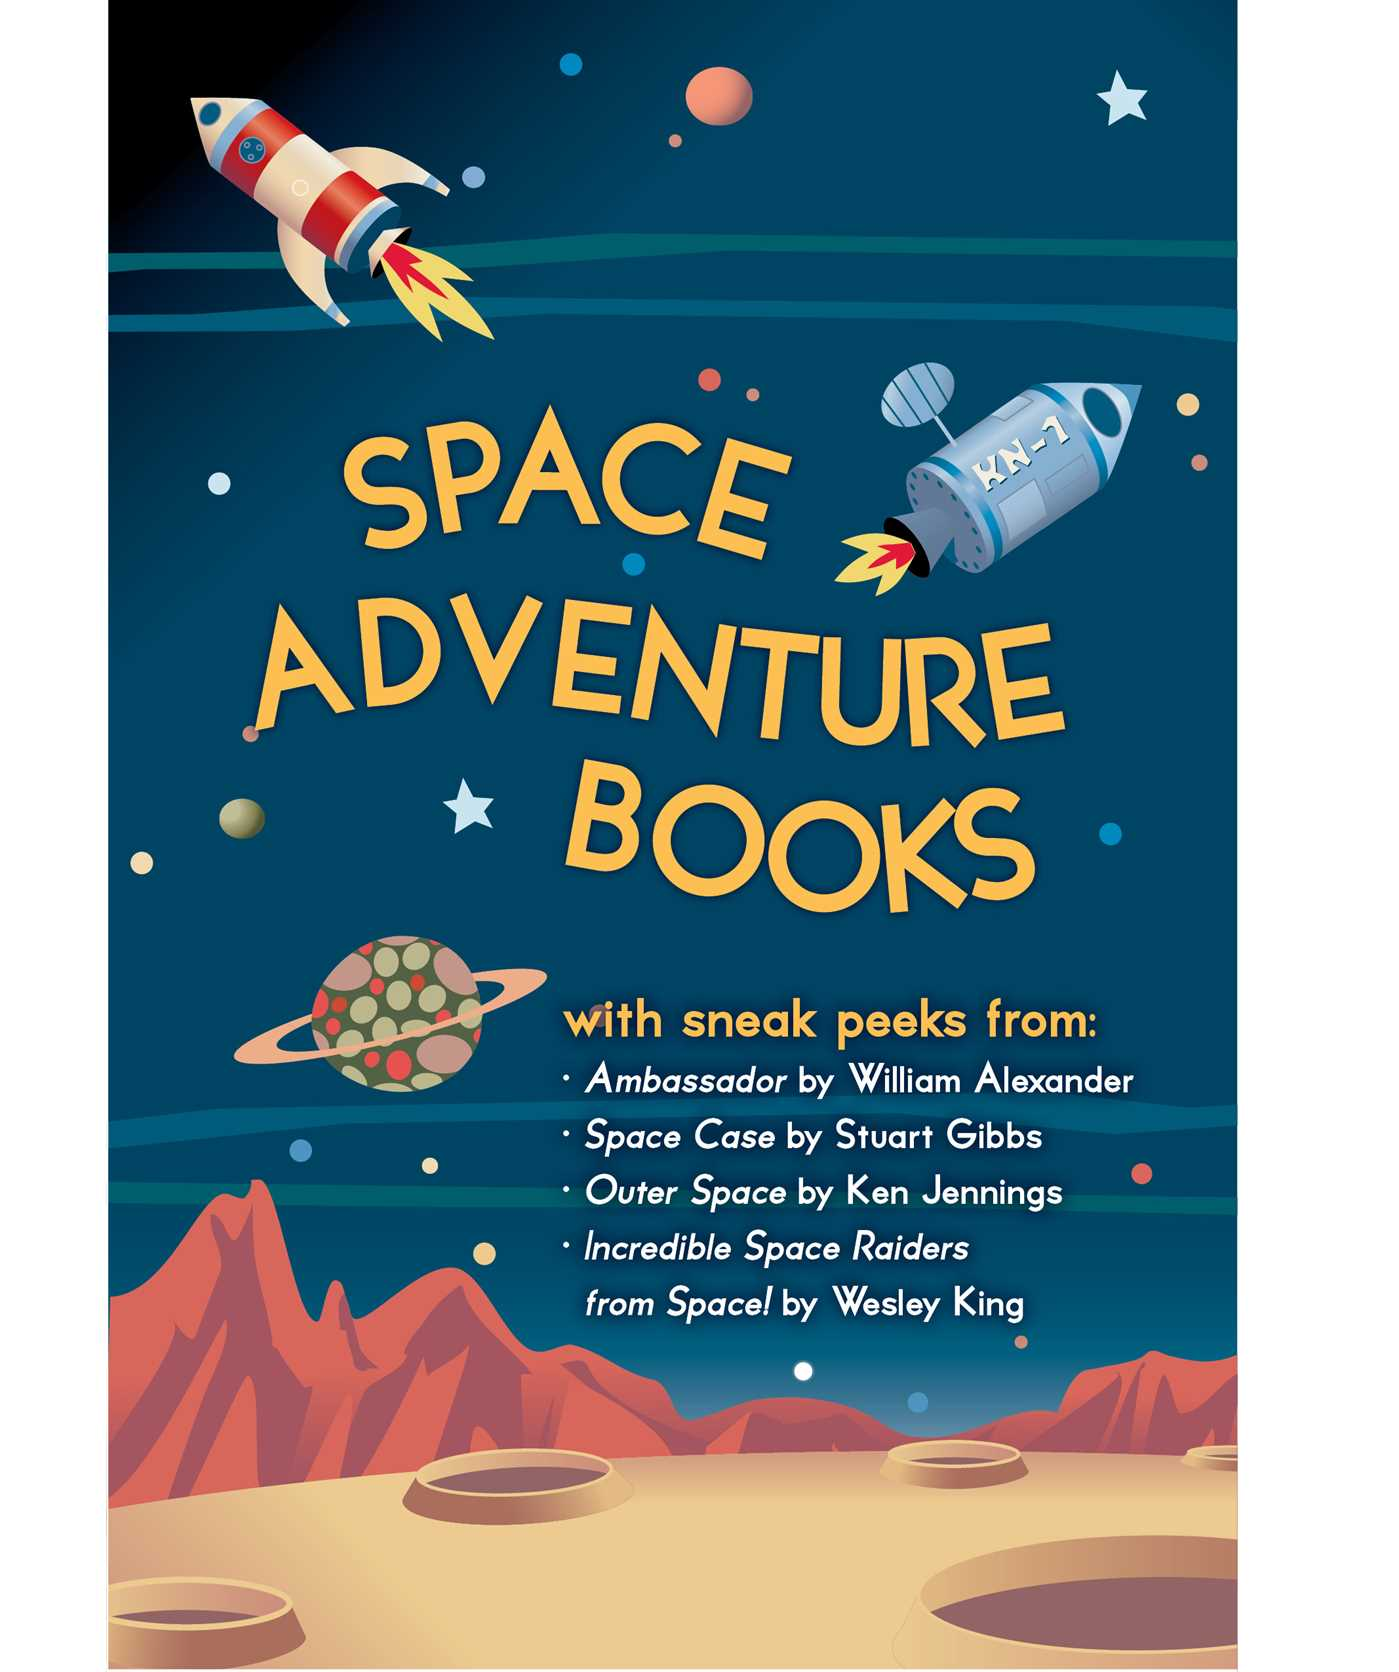 Space adventure books sampler 9781481434973 hr